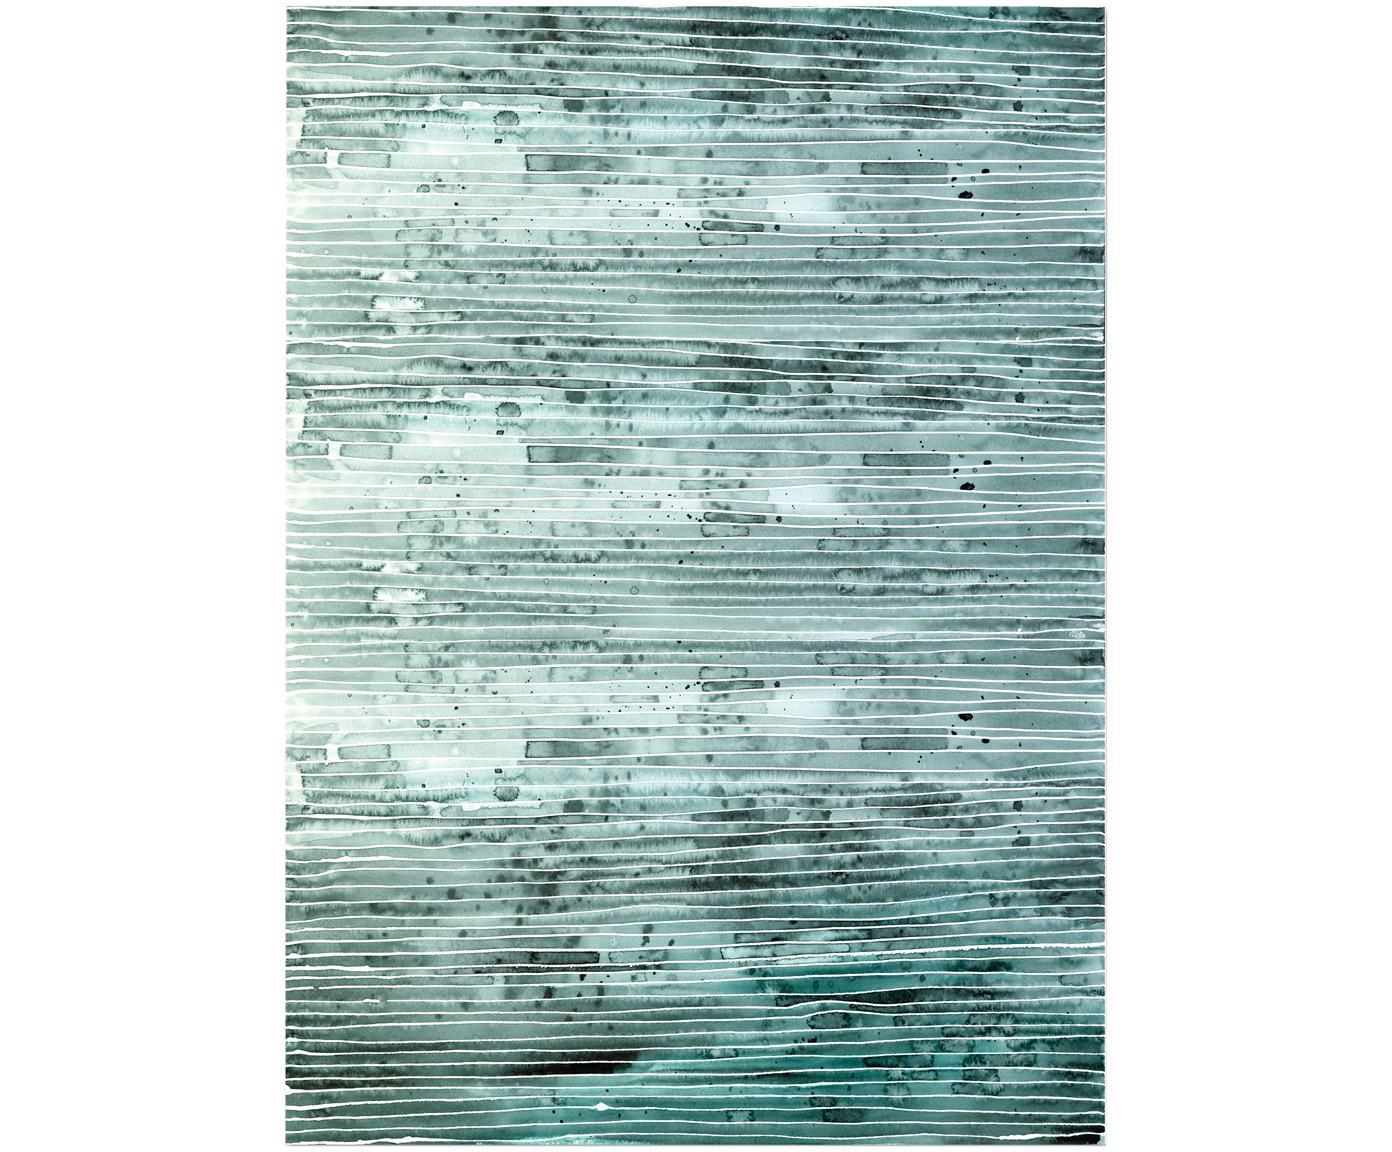 Cadeaupapier Green Lines, 3 rollen, Papier, Groen, wit, 50 x 70 cm